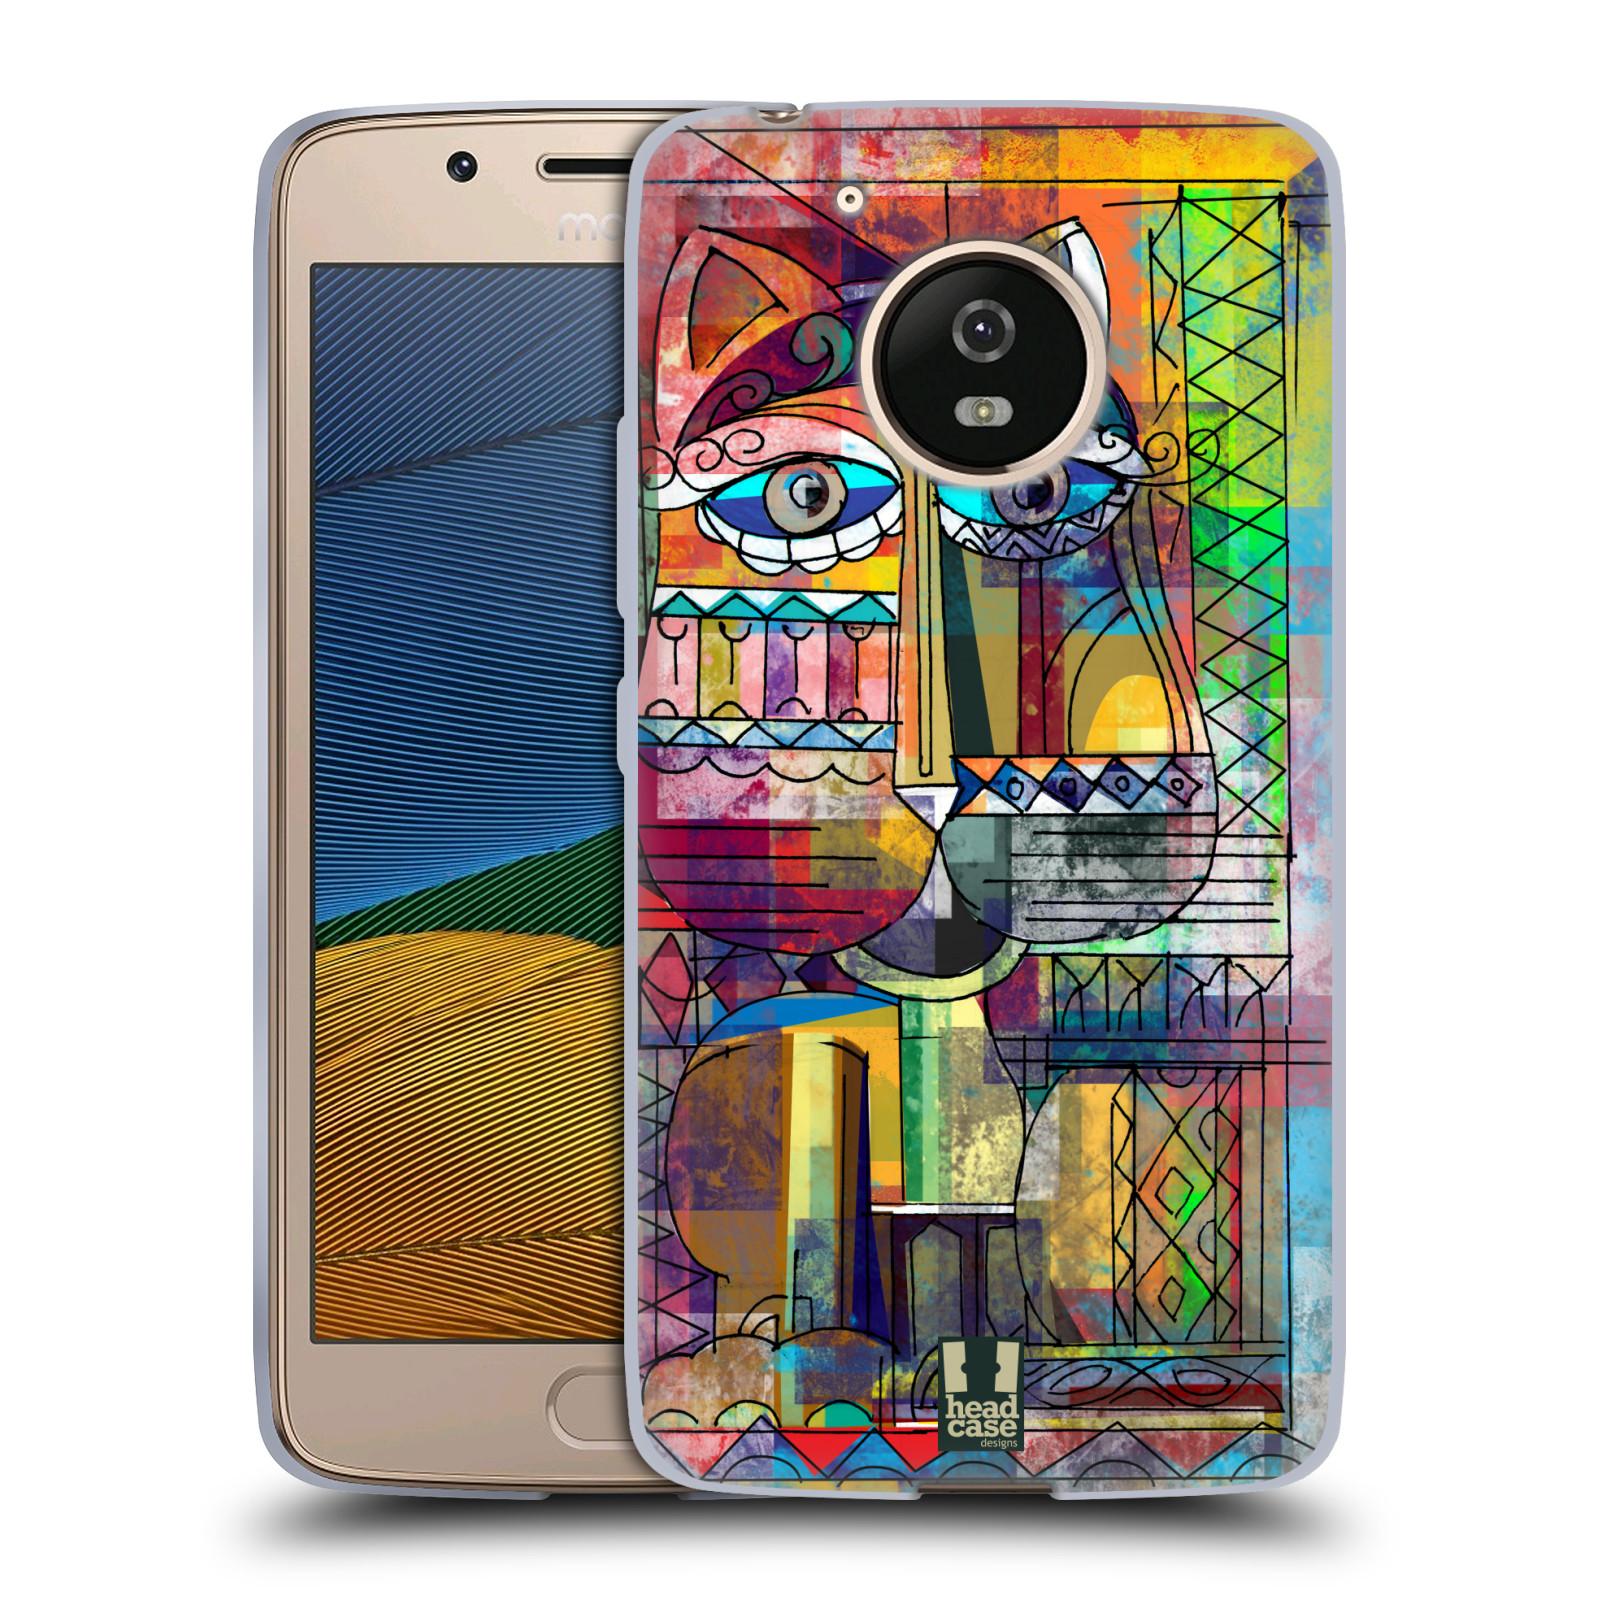 Silikonové pouzdro na mobil Lenovo Moto G5 - Head Case AZTEC KORAT